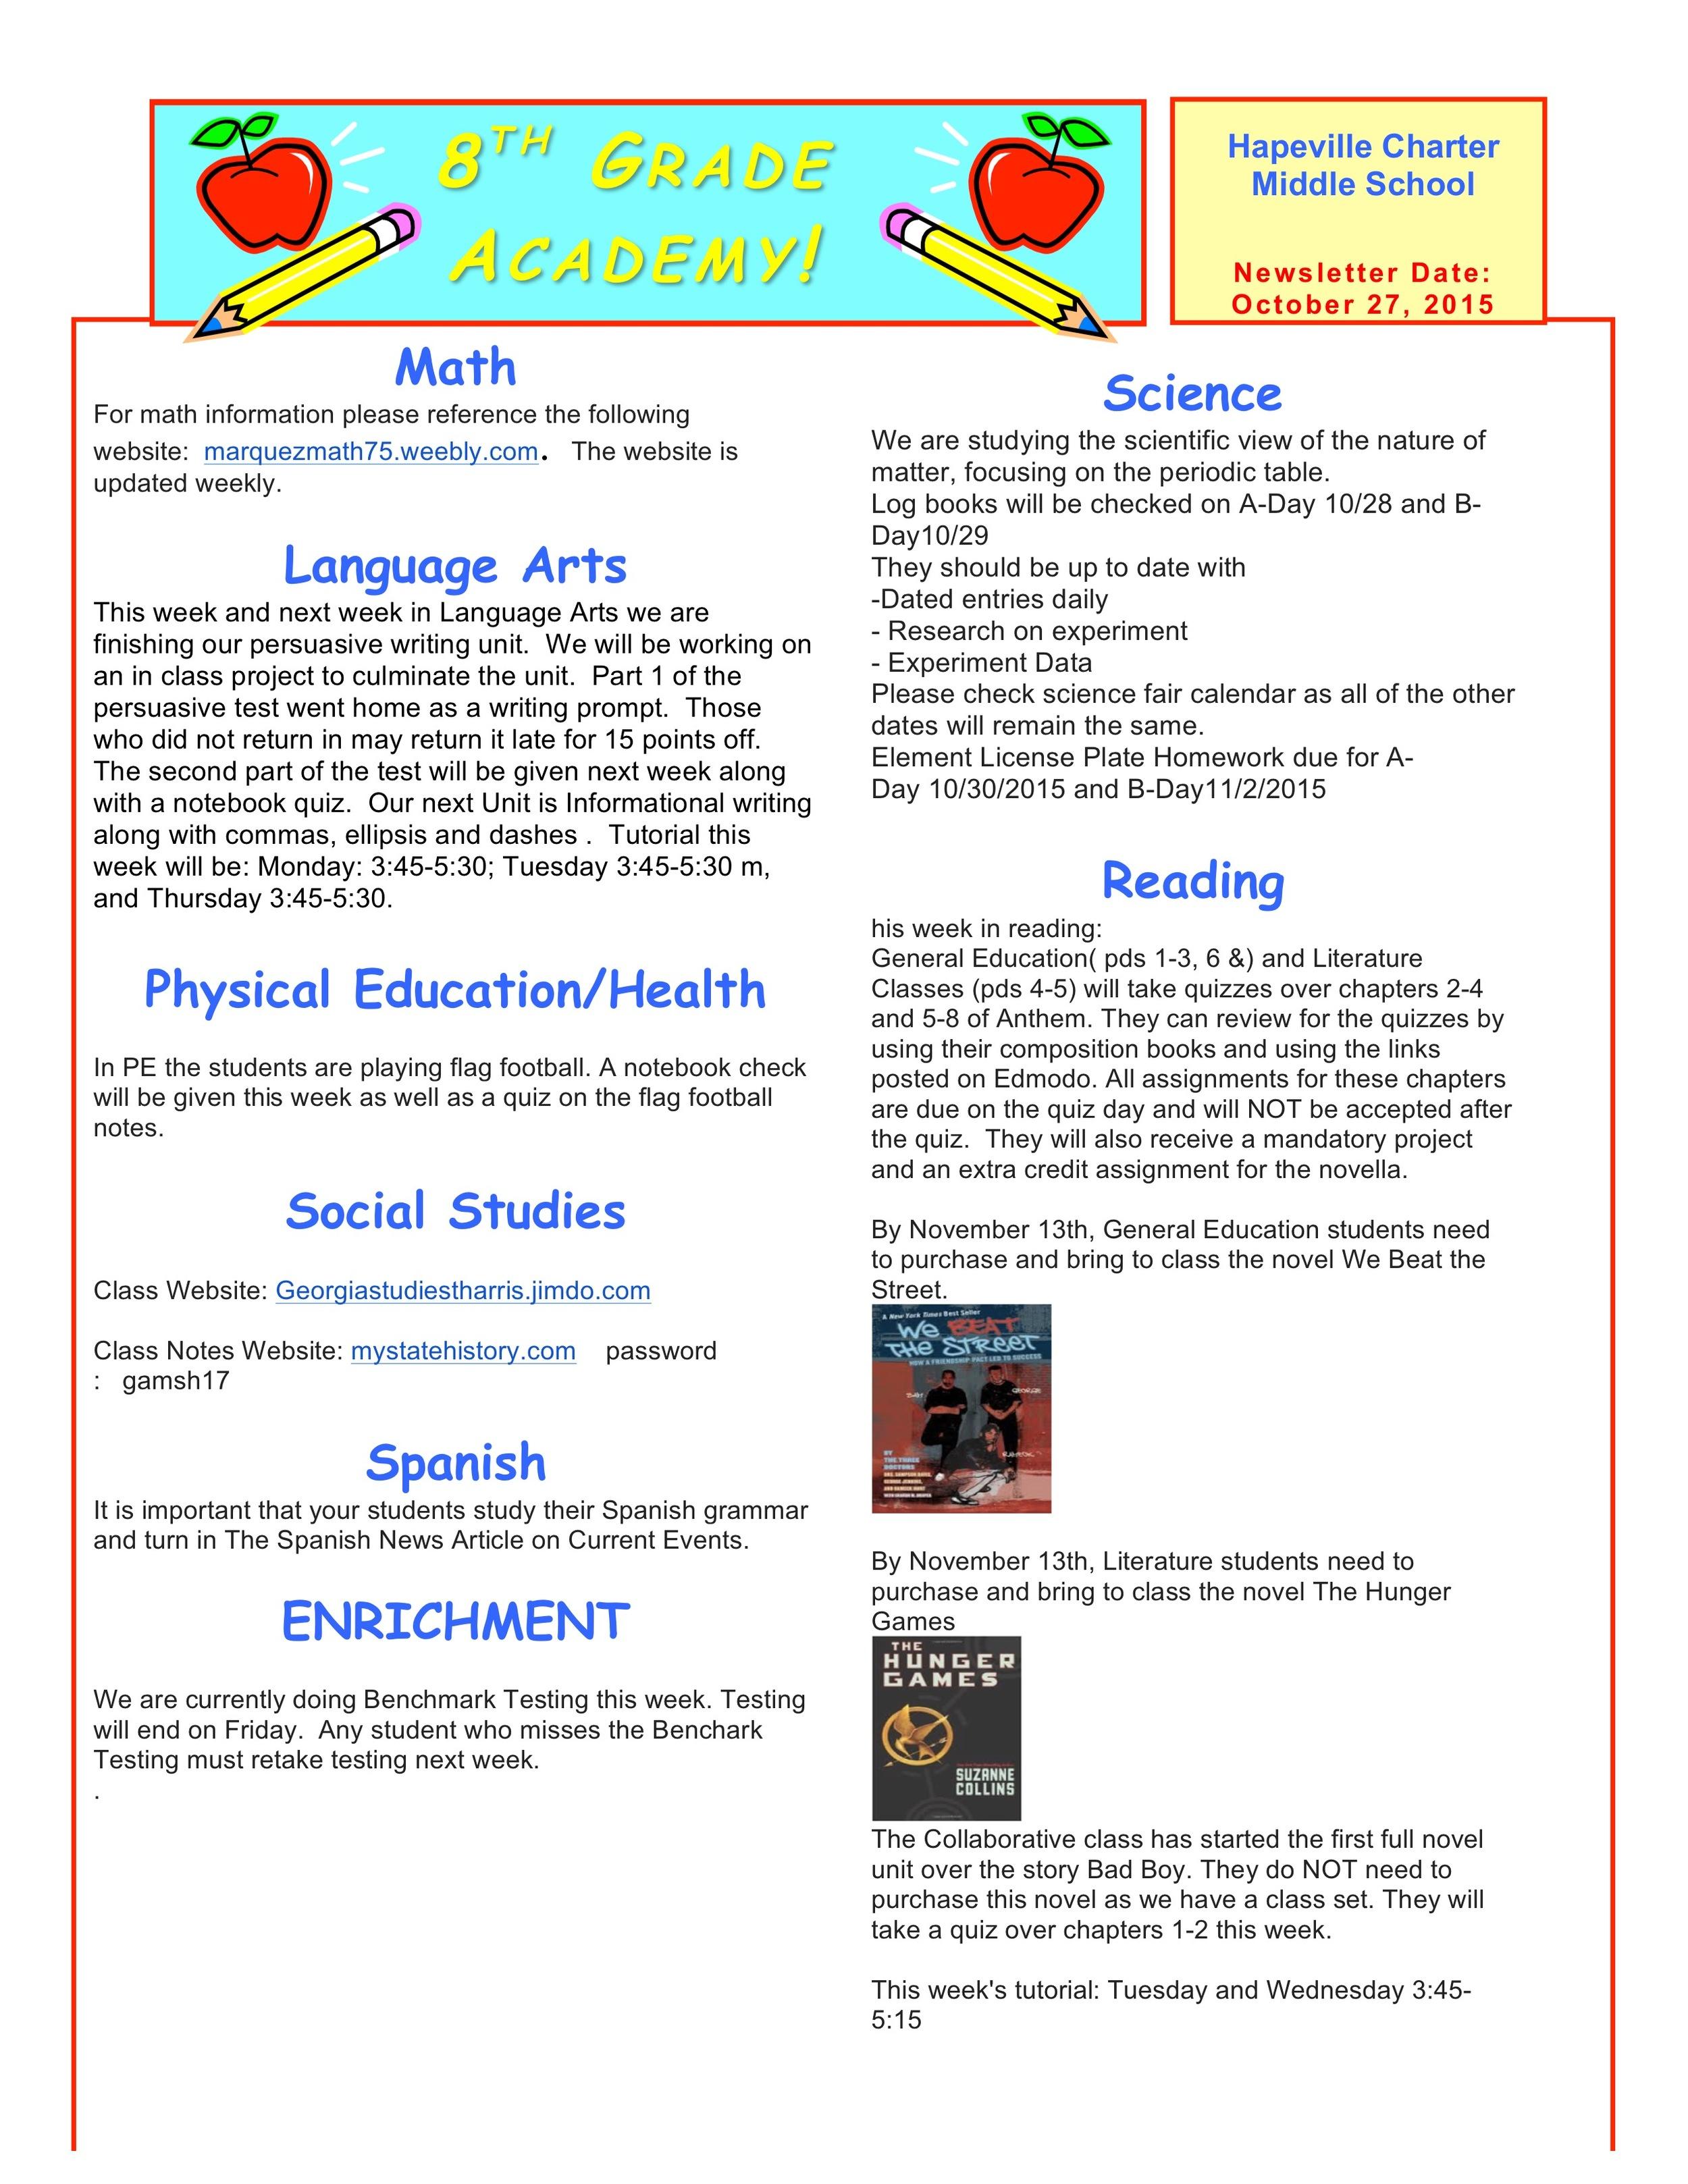 Newsletter Image8th grade October 27 2015.jpeg